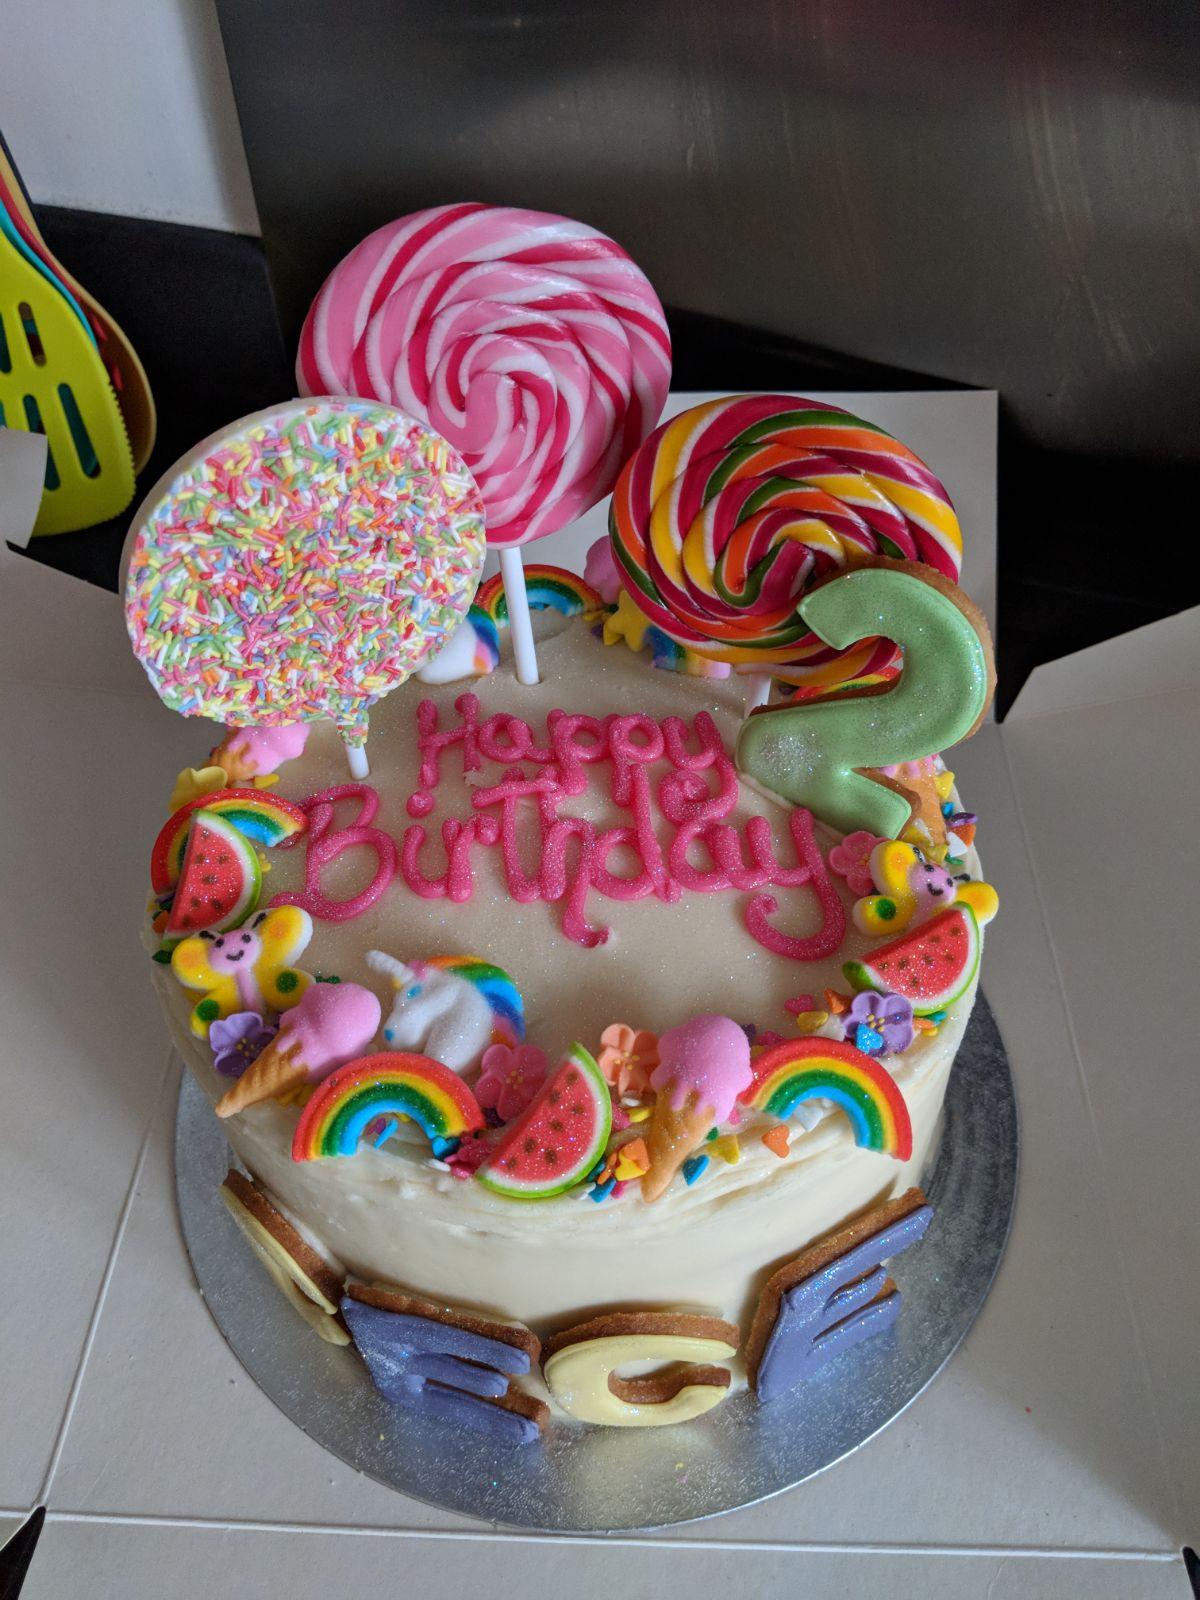 APRIL BIRTHDAY CAKE